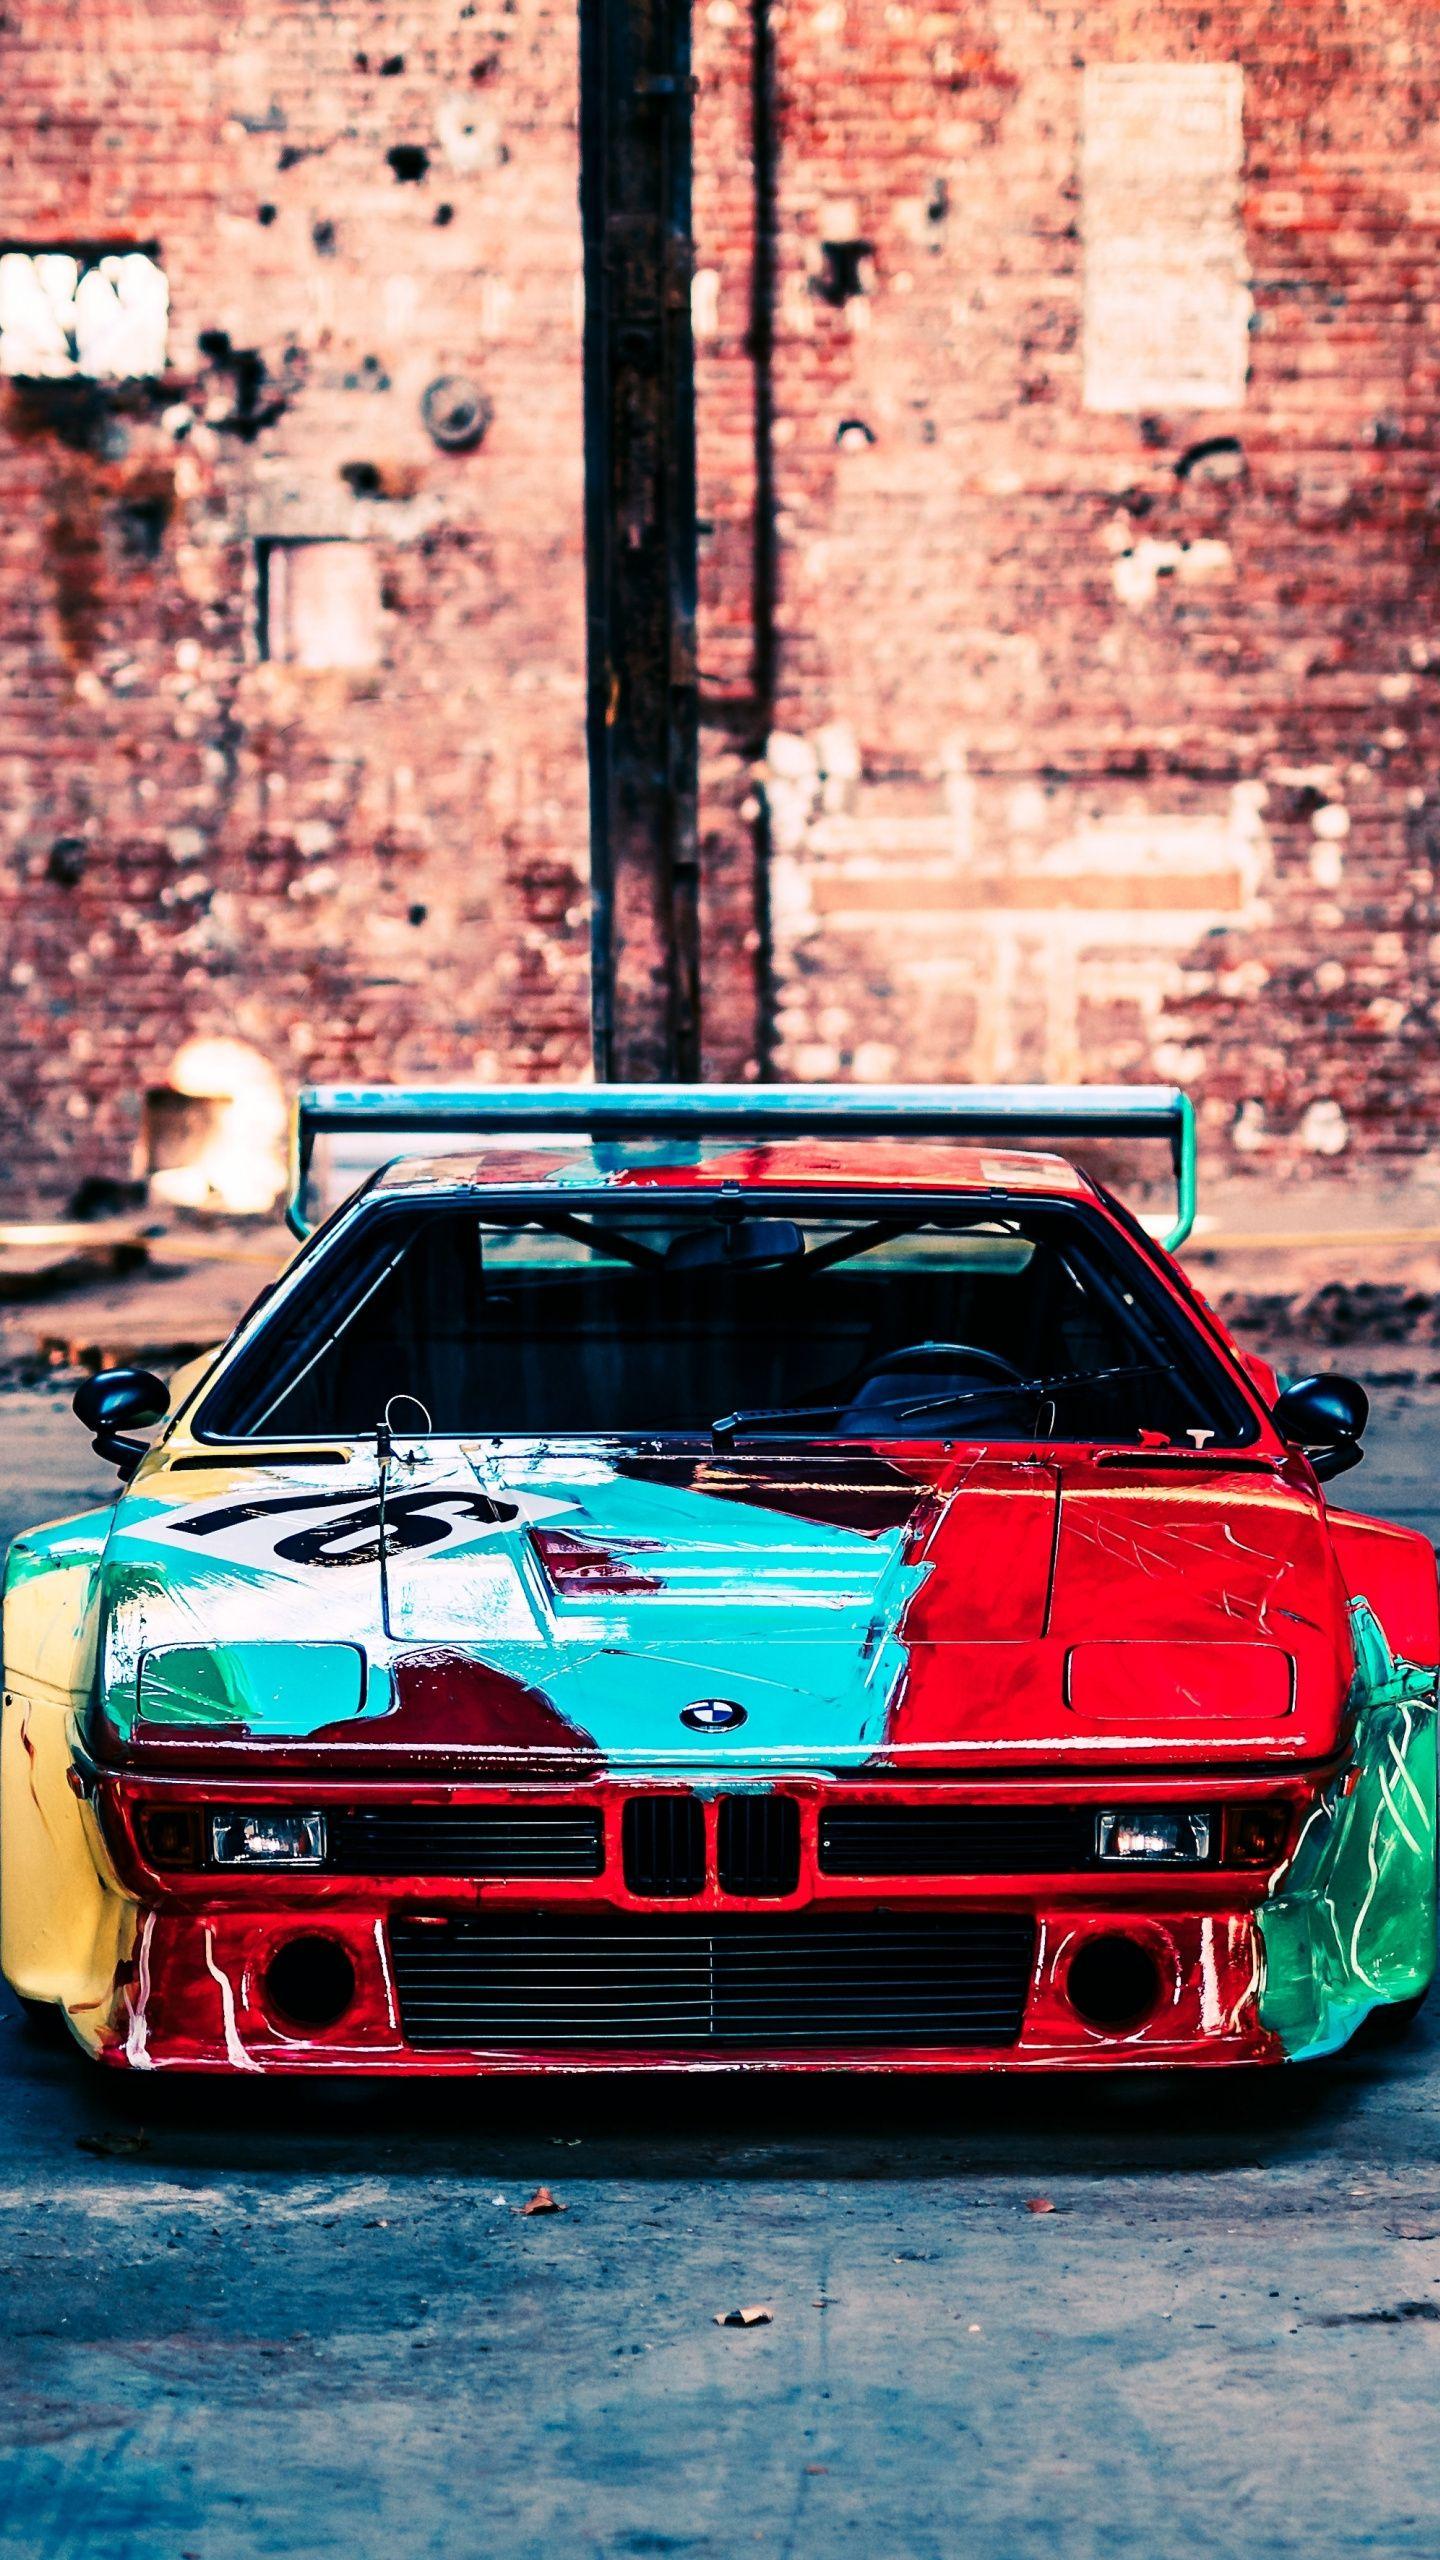 1440x2560 Bmw Car Art Italdesign Wallpaper Bmw Art Car Art Bmw M1